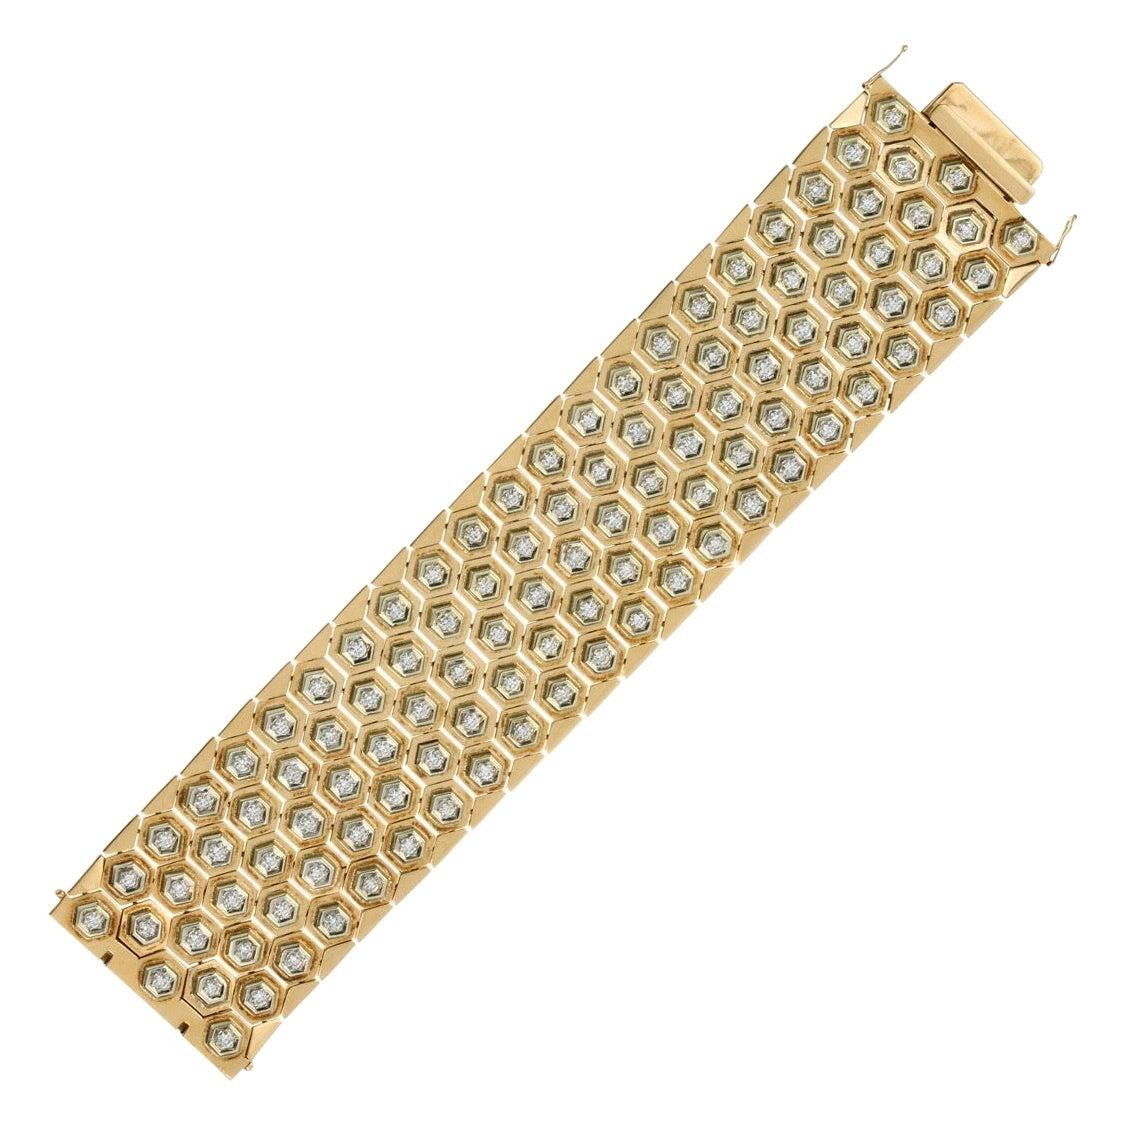 15 Carat Diamond Fancy Link Bracelet in 18 Karat Yellow Gold Hexagonal Links